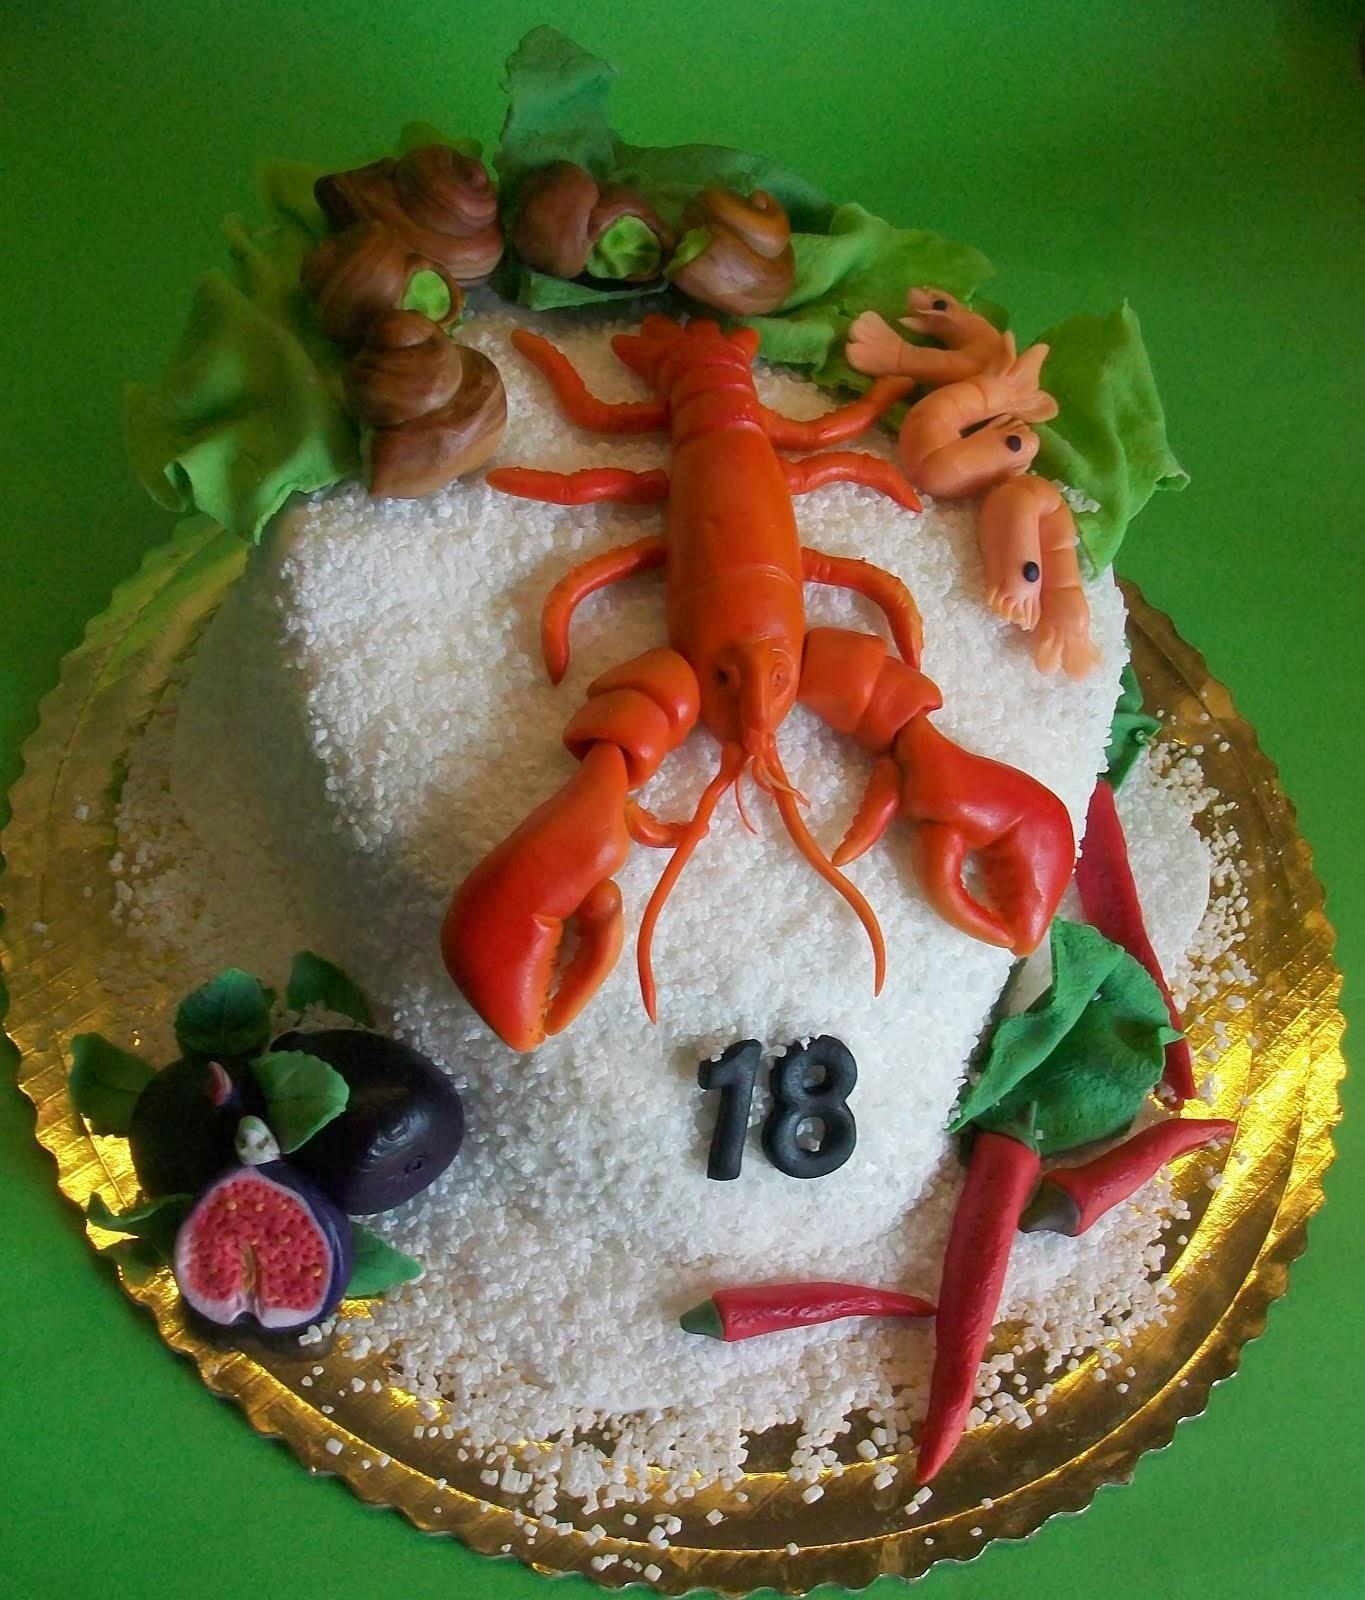 tort z owocami morza